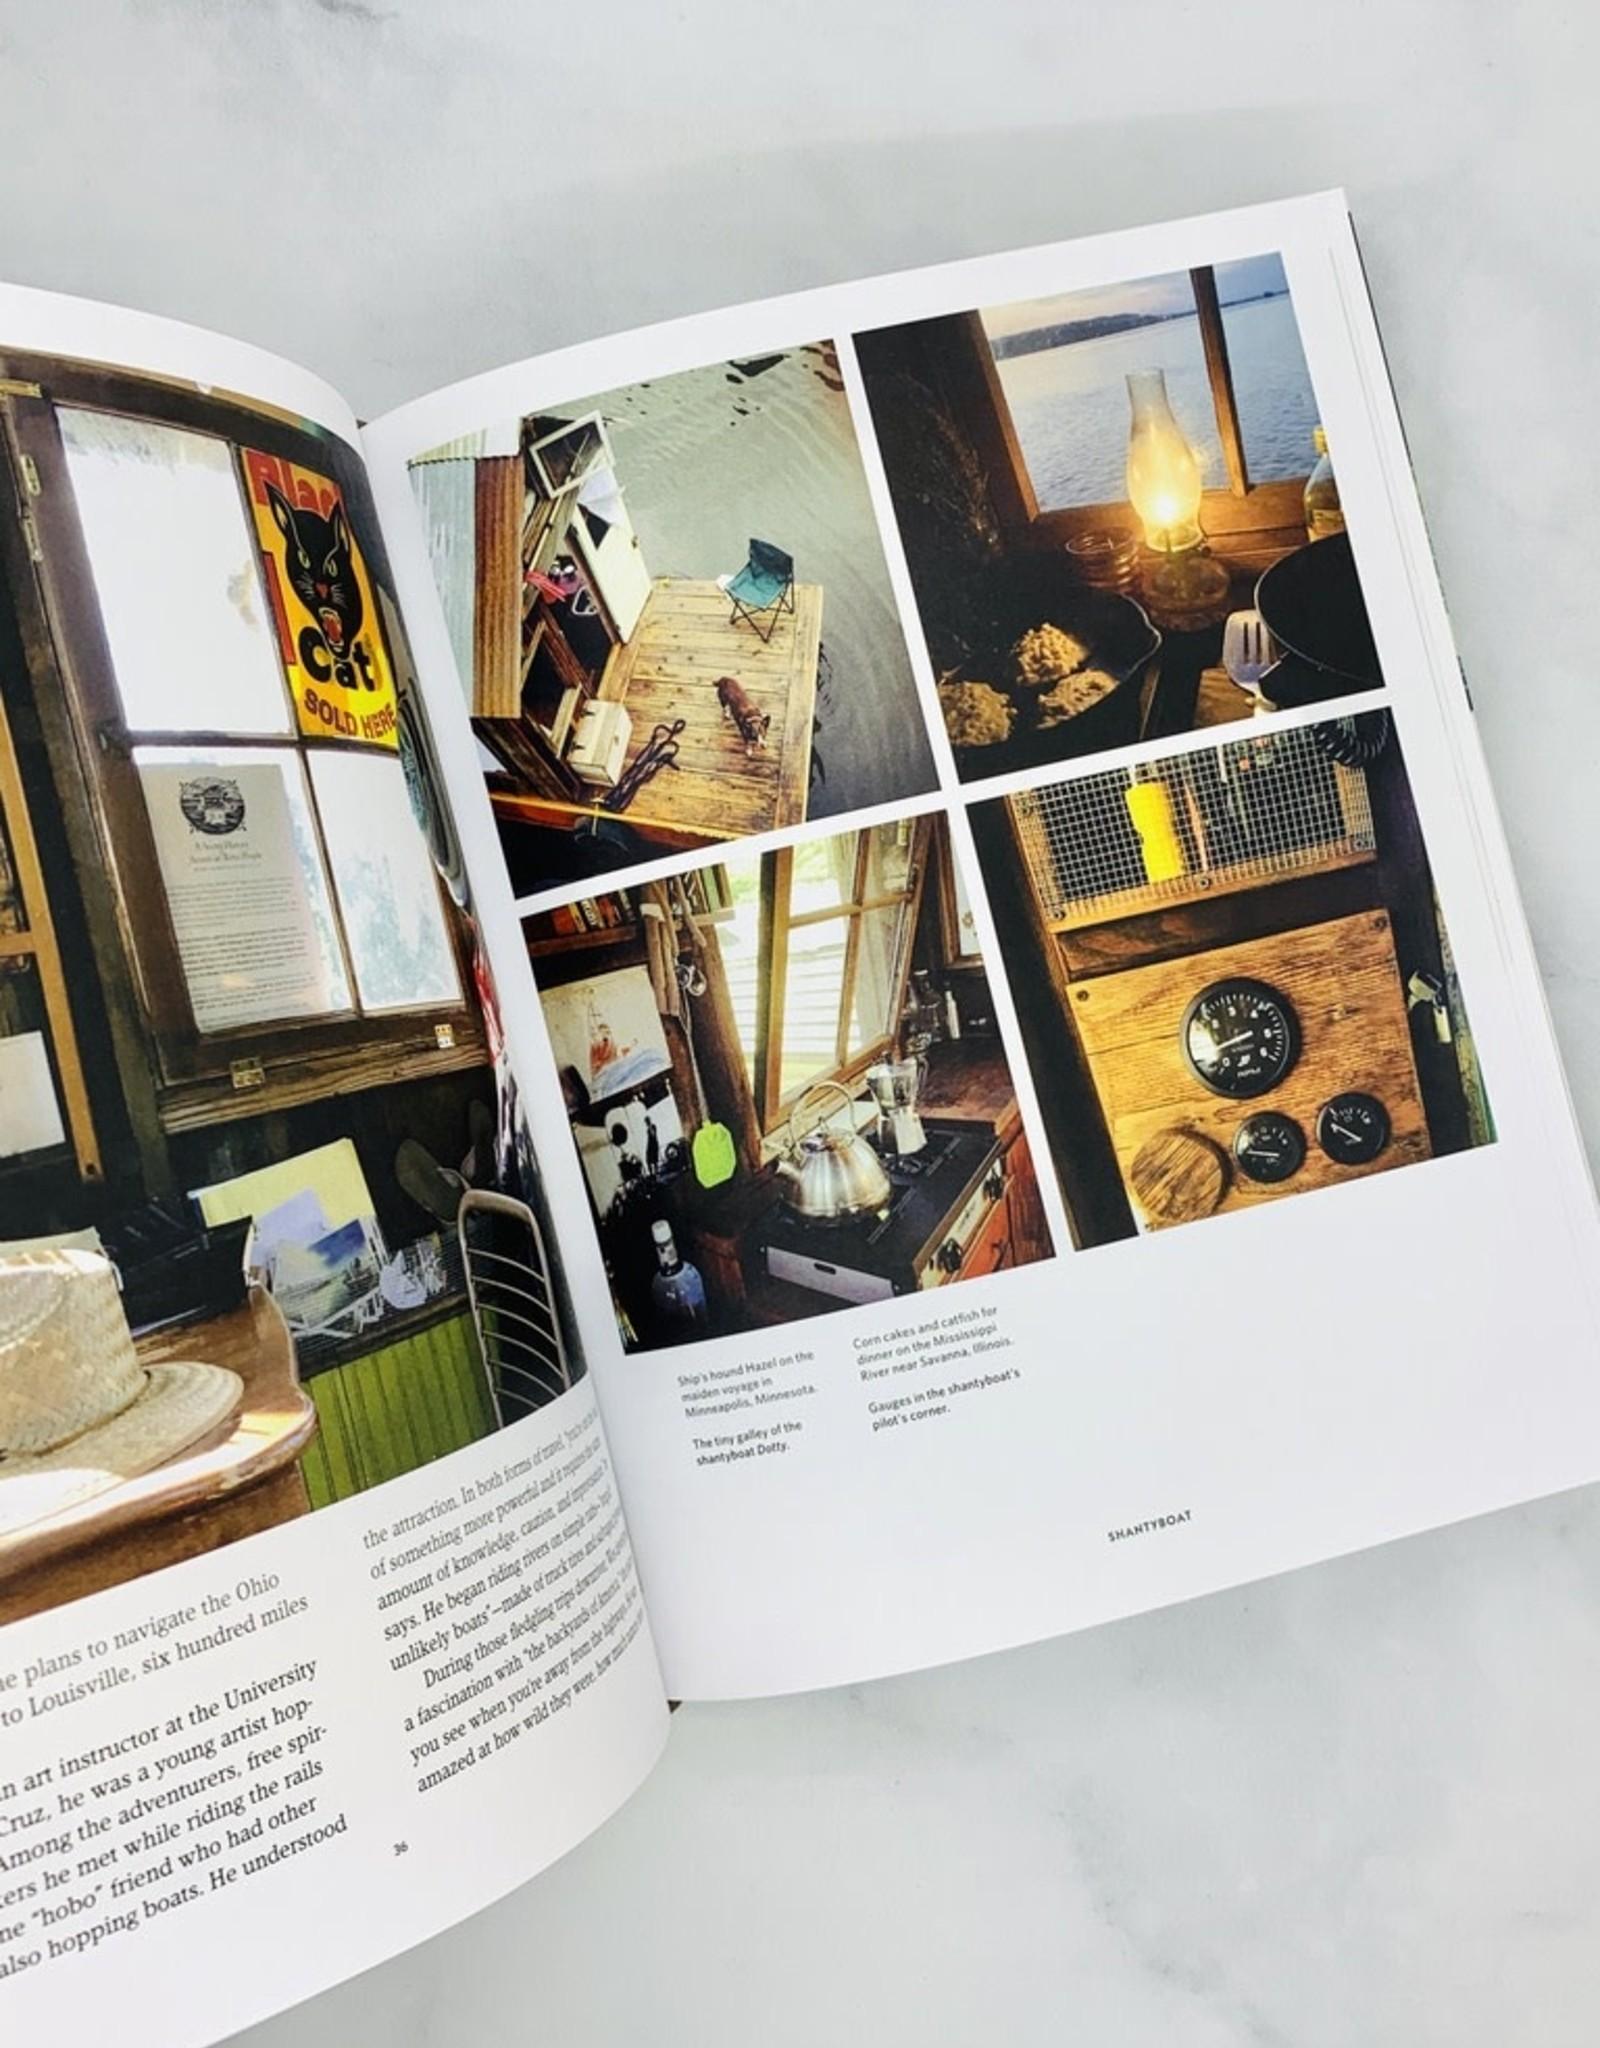 Hachette Book Group Cabin Porn: Inside